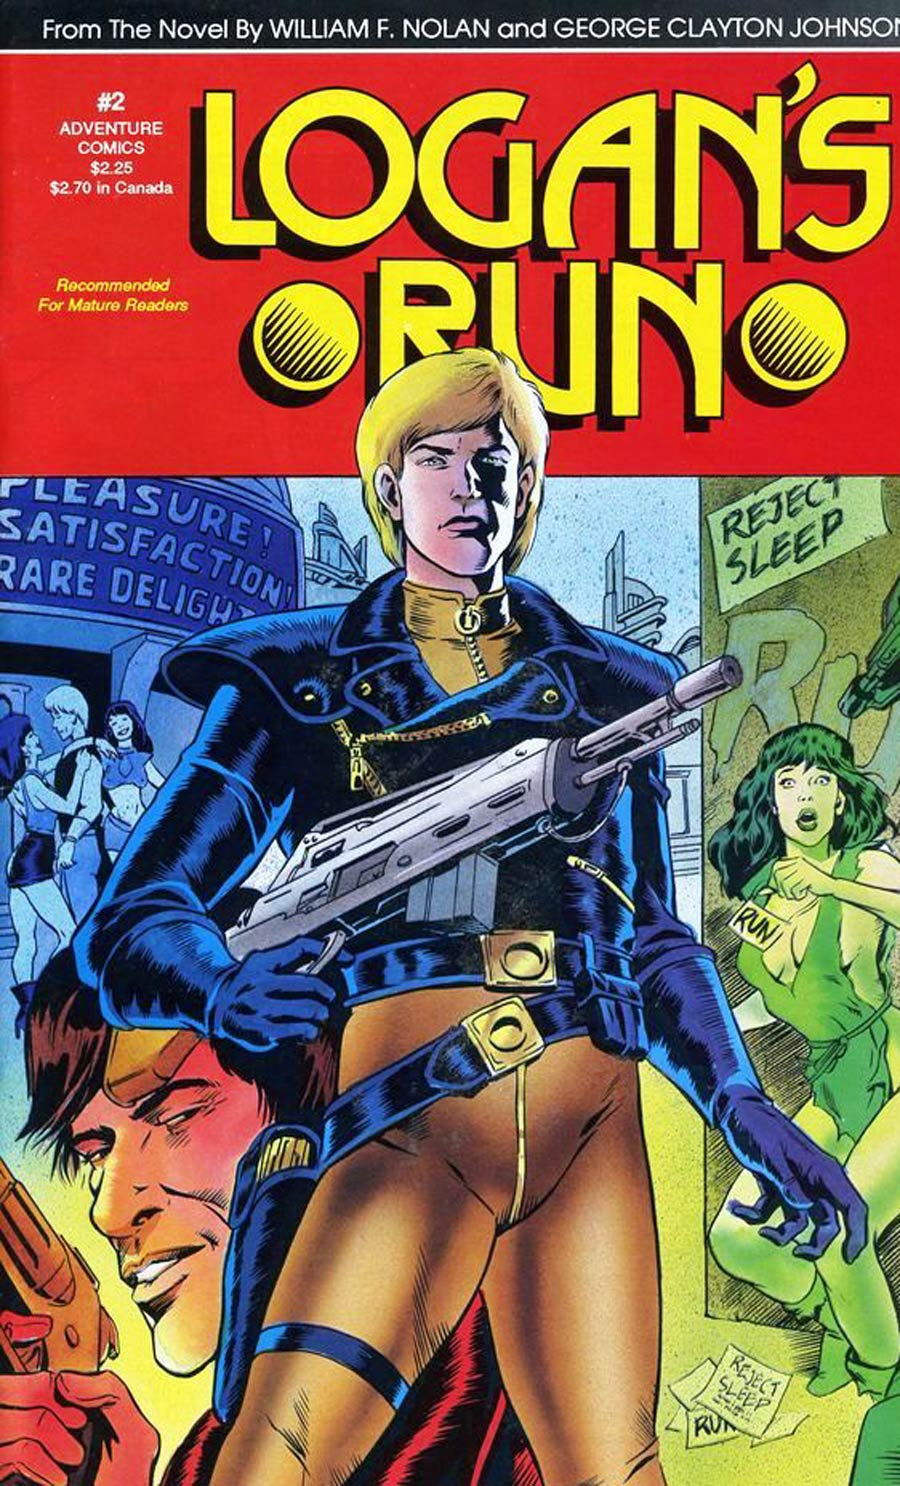 Logans Run (Adventure Comics) #2